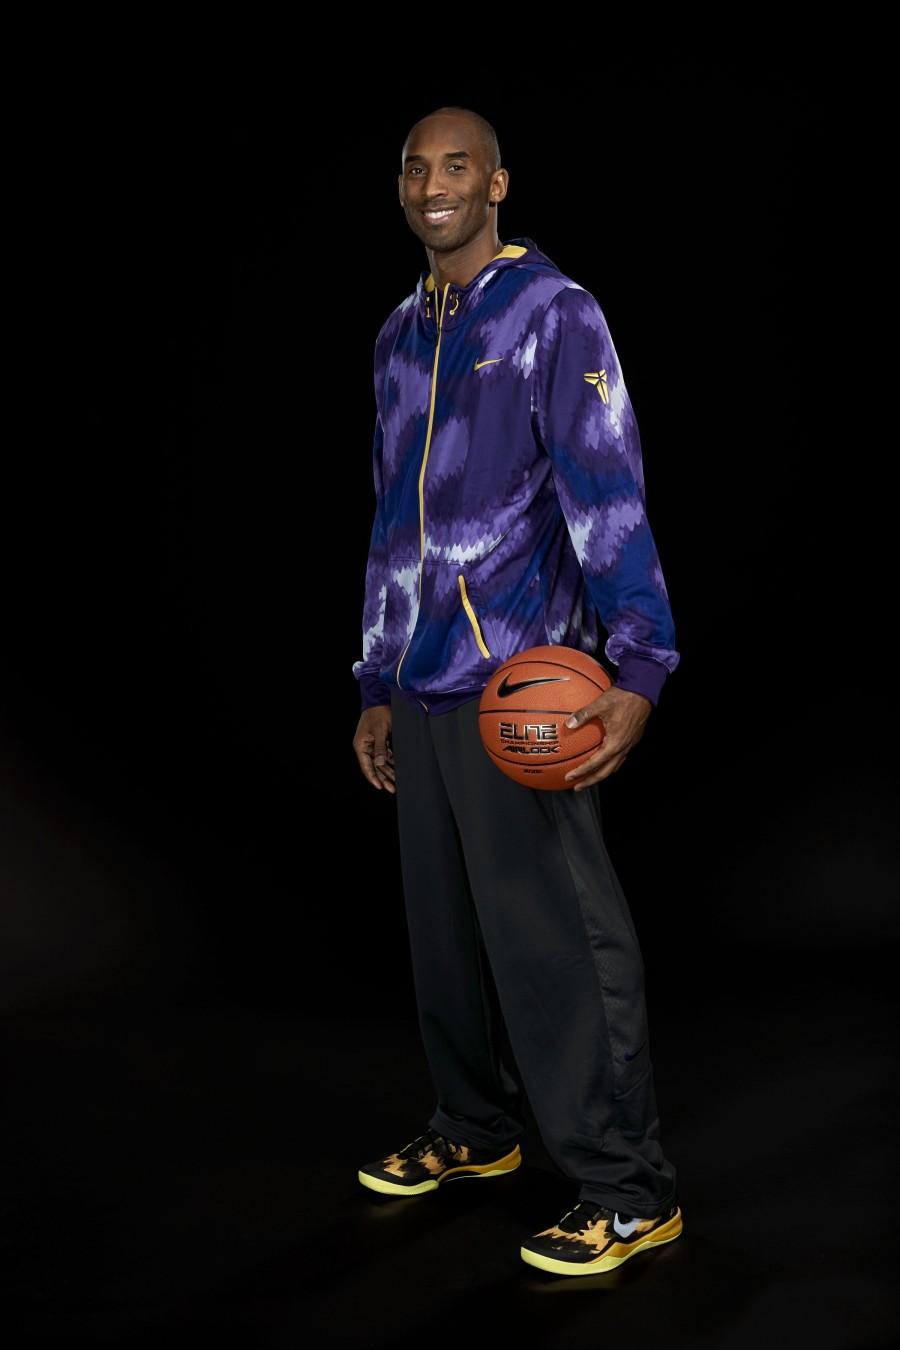 nike-basketball-inside-acces-4